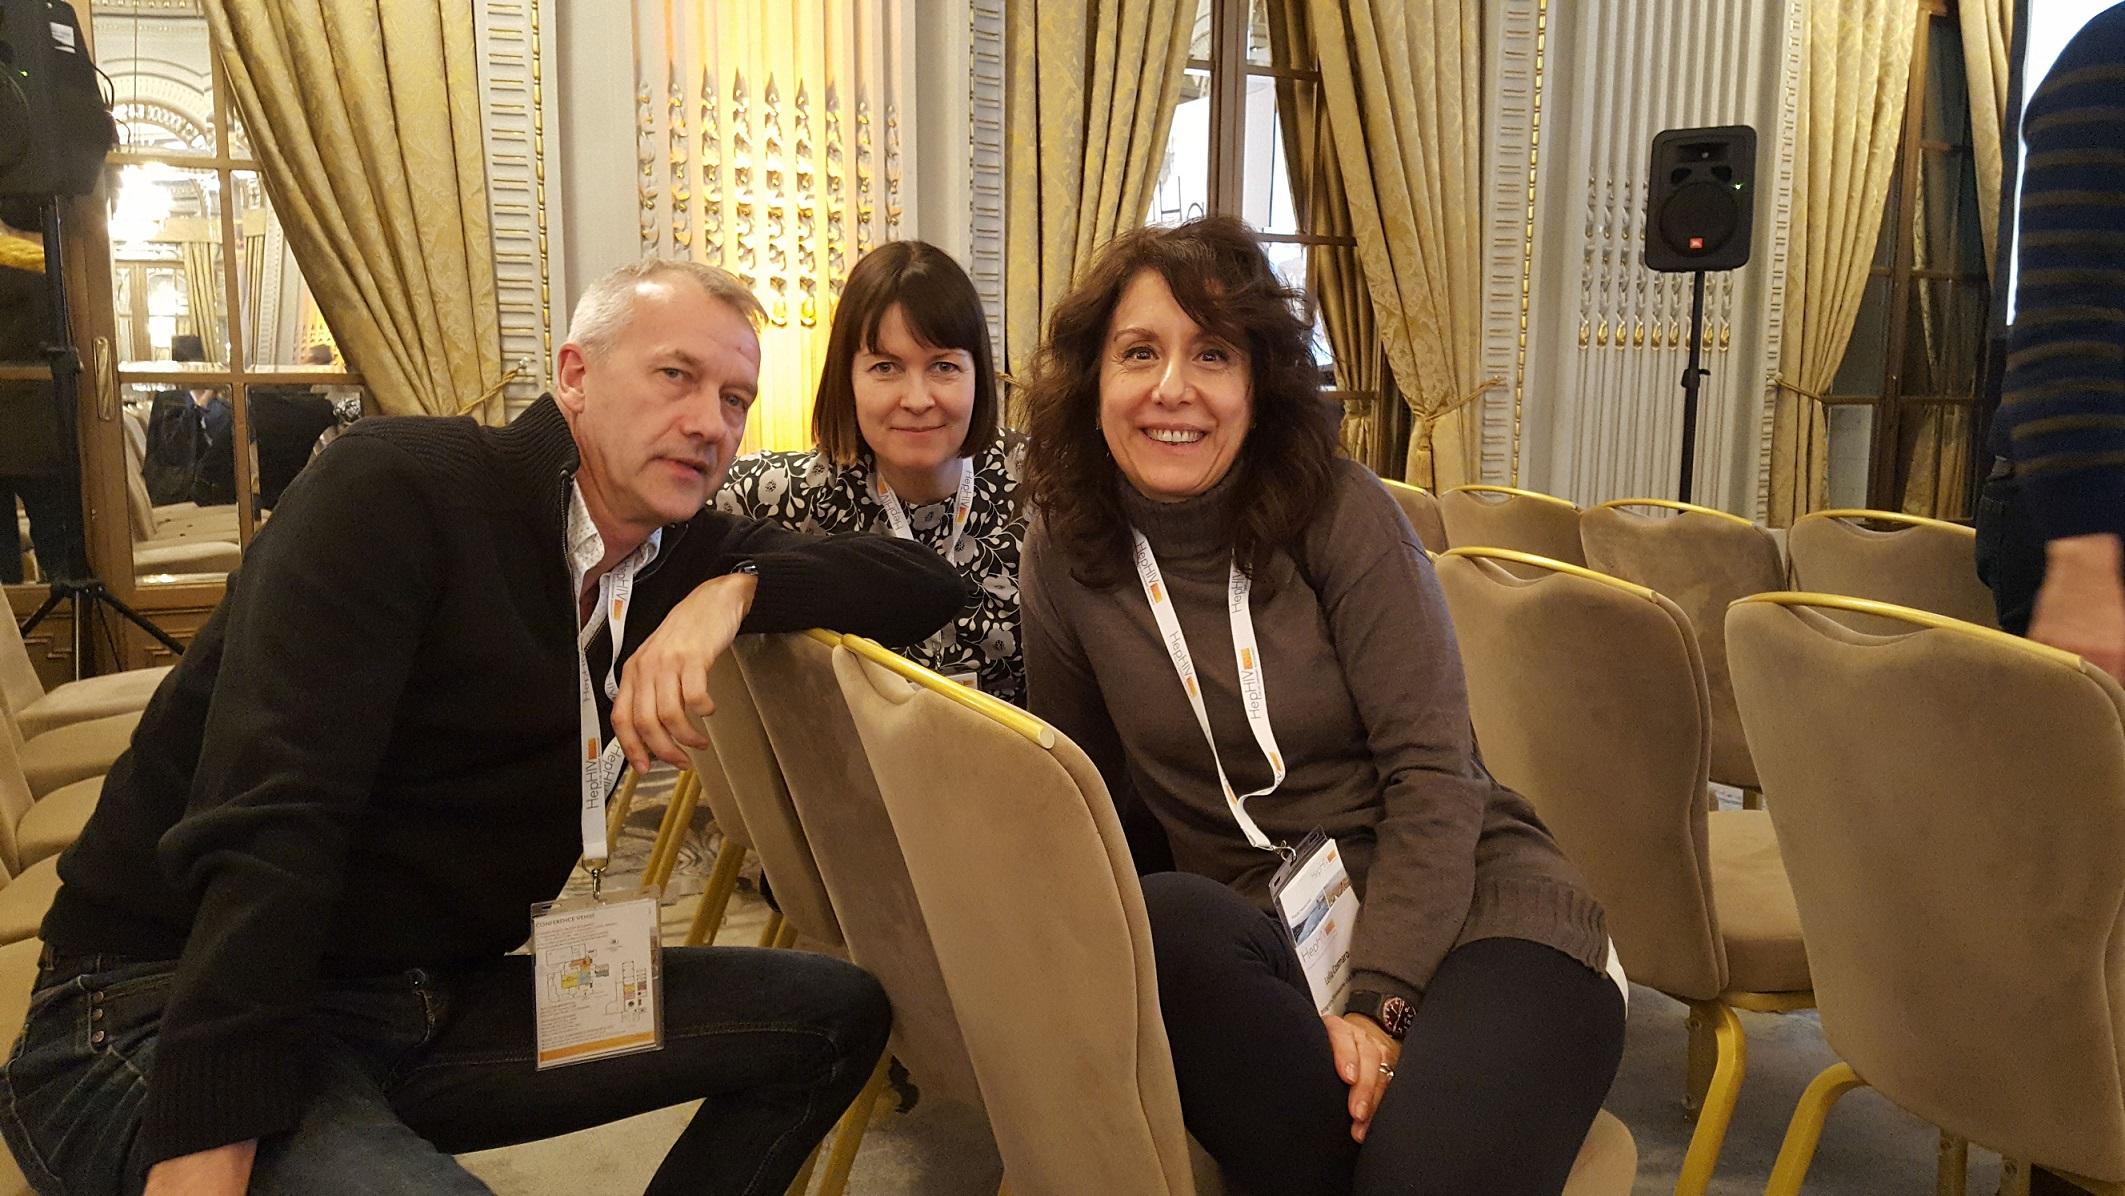 Michael Krone (AAE), Sini Pasanen (Positiiviset ry, HivFinland), Lella Cosmaro (INTEGRATE, LILA Milano) at HepHIV 2019